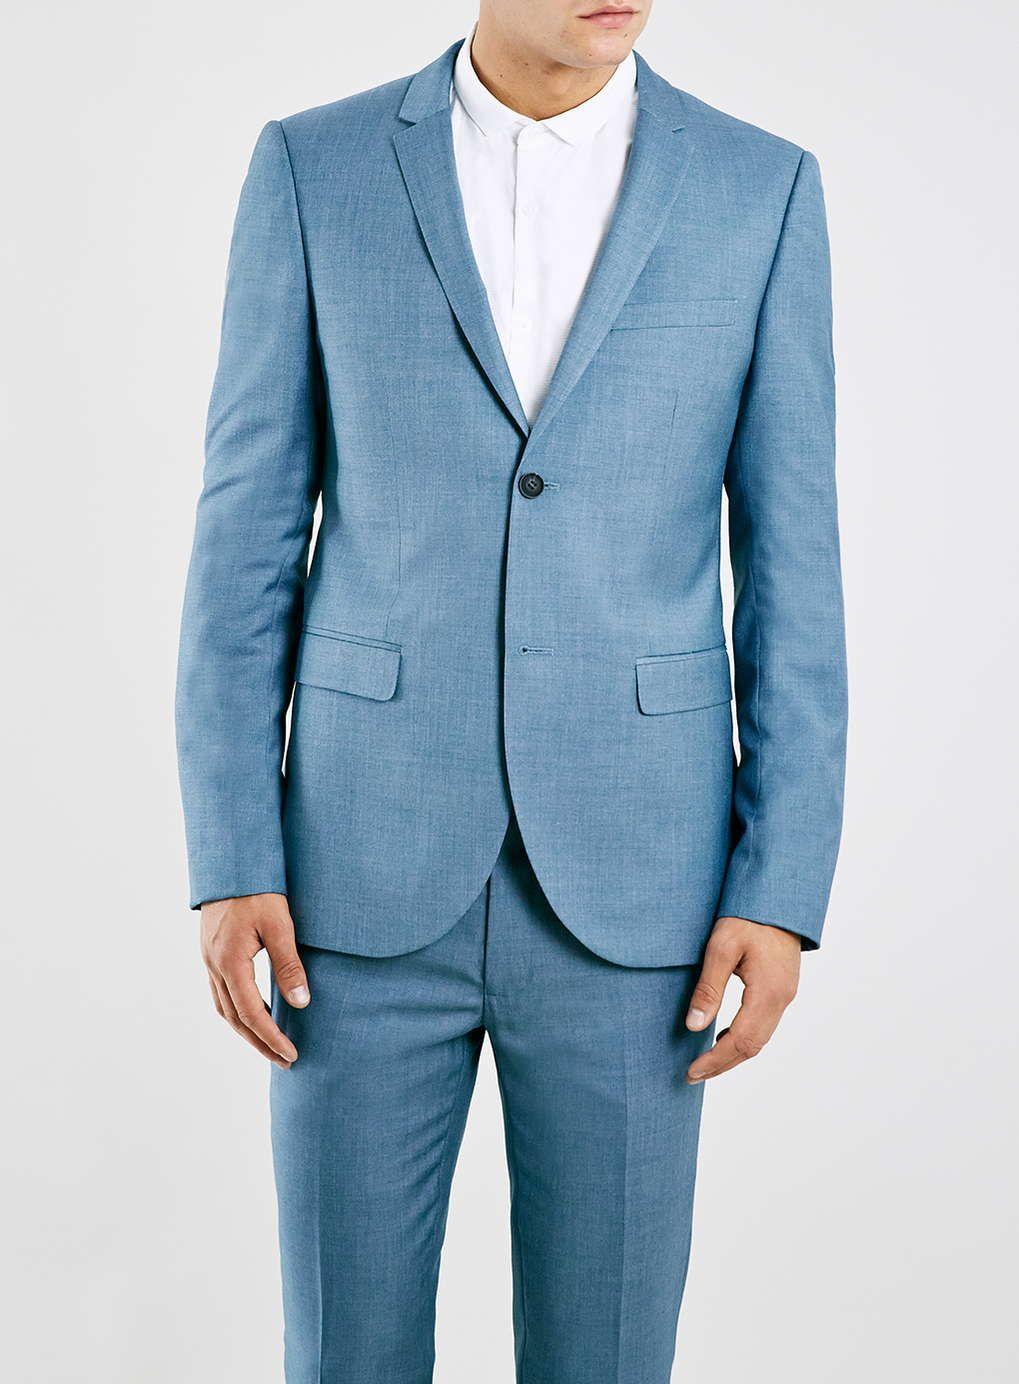 Light Blue Textured Skinny Fit Suit Jacket | Pinterest | Skinny fit ...